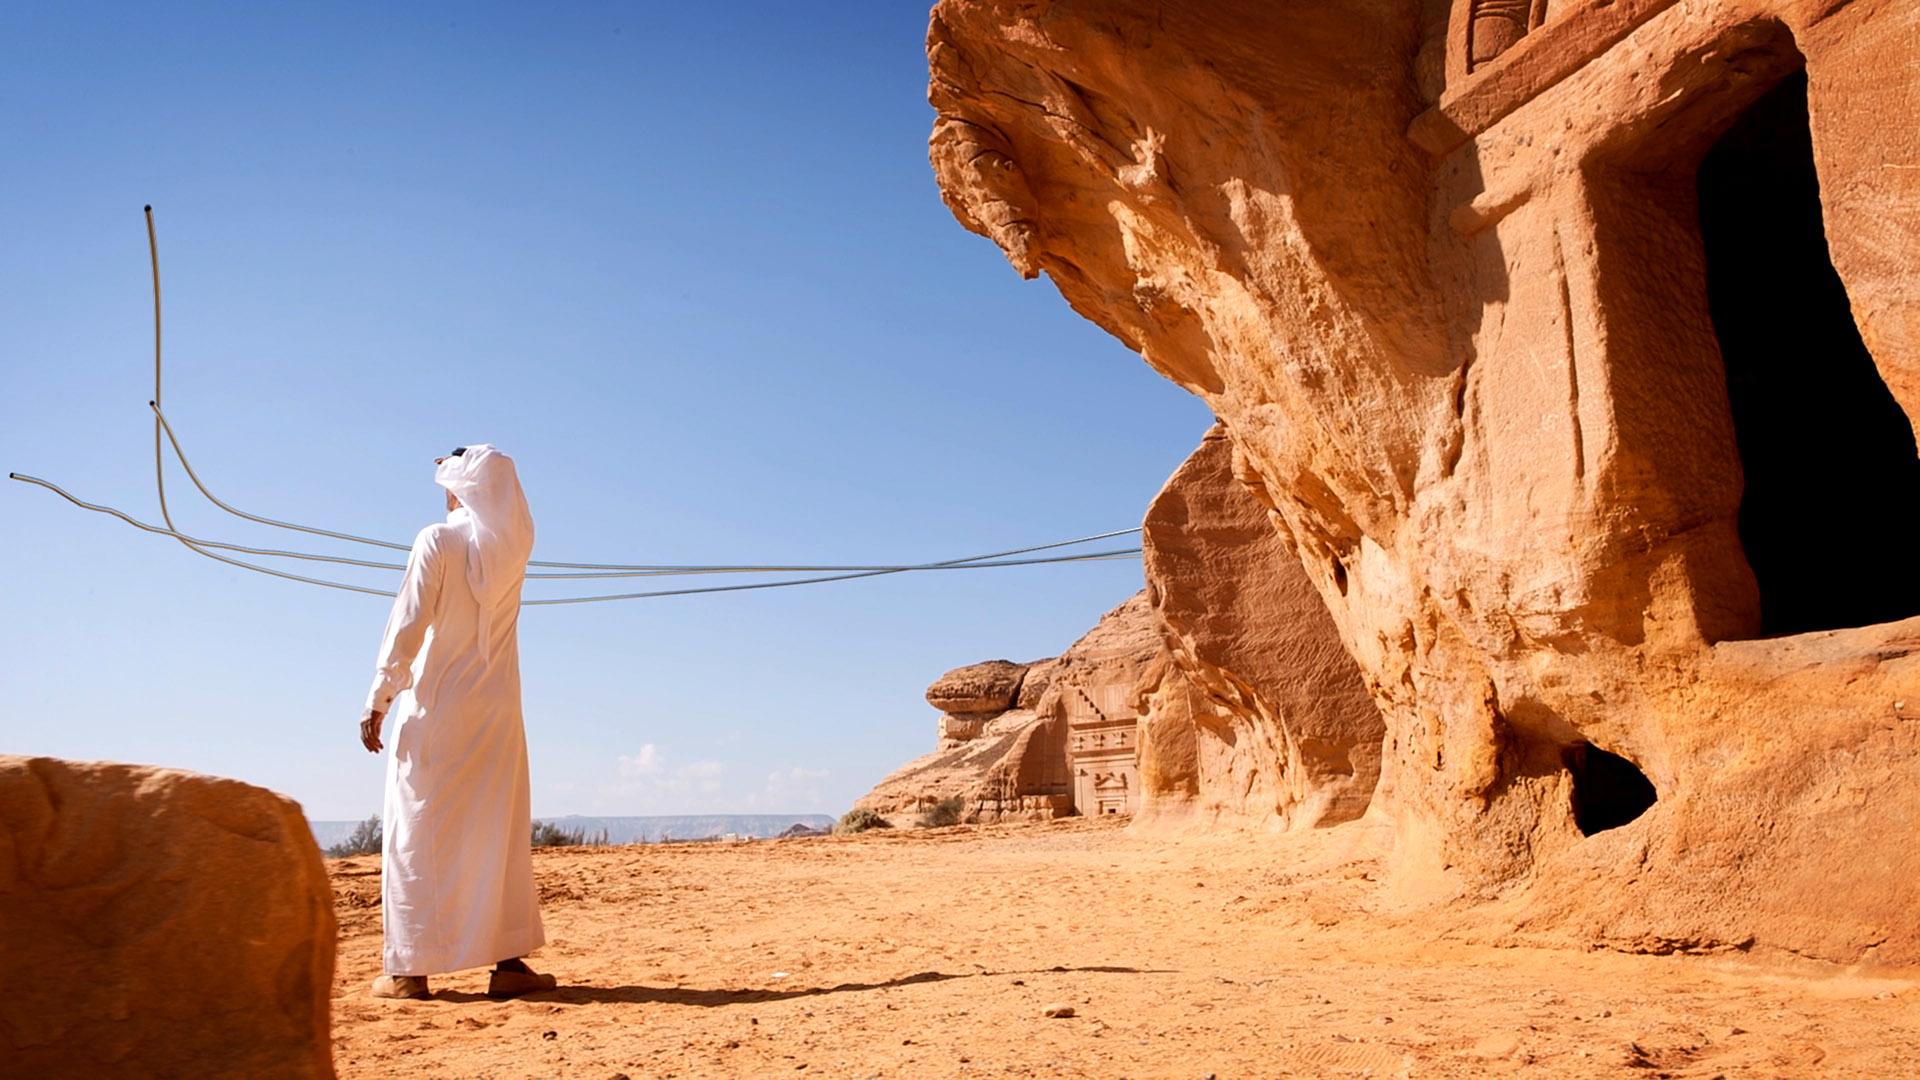 King Abdulaziz Center for World Culture